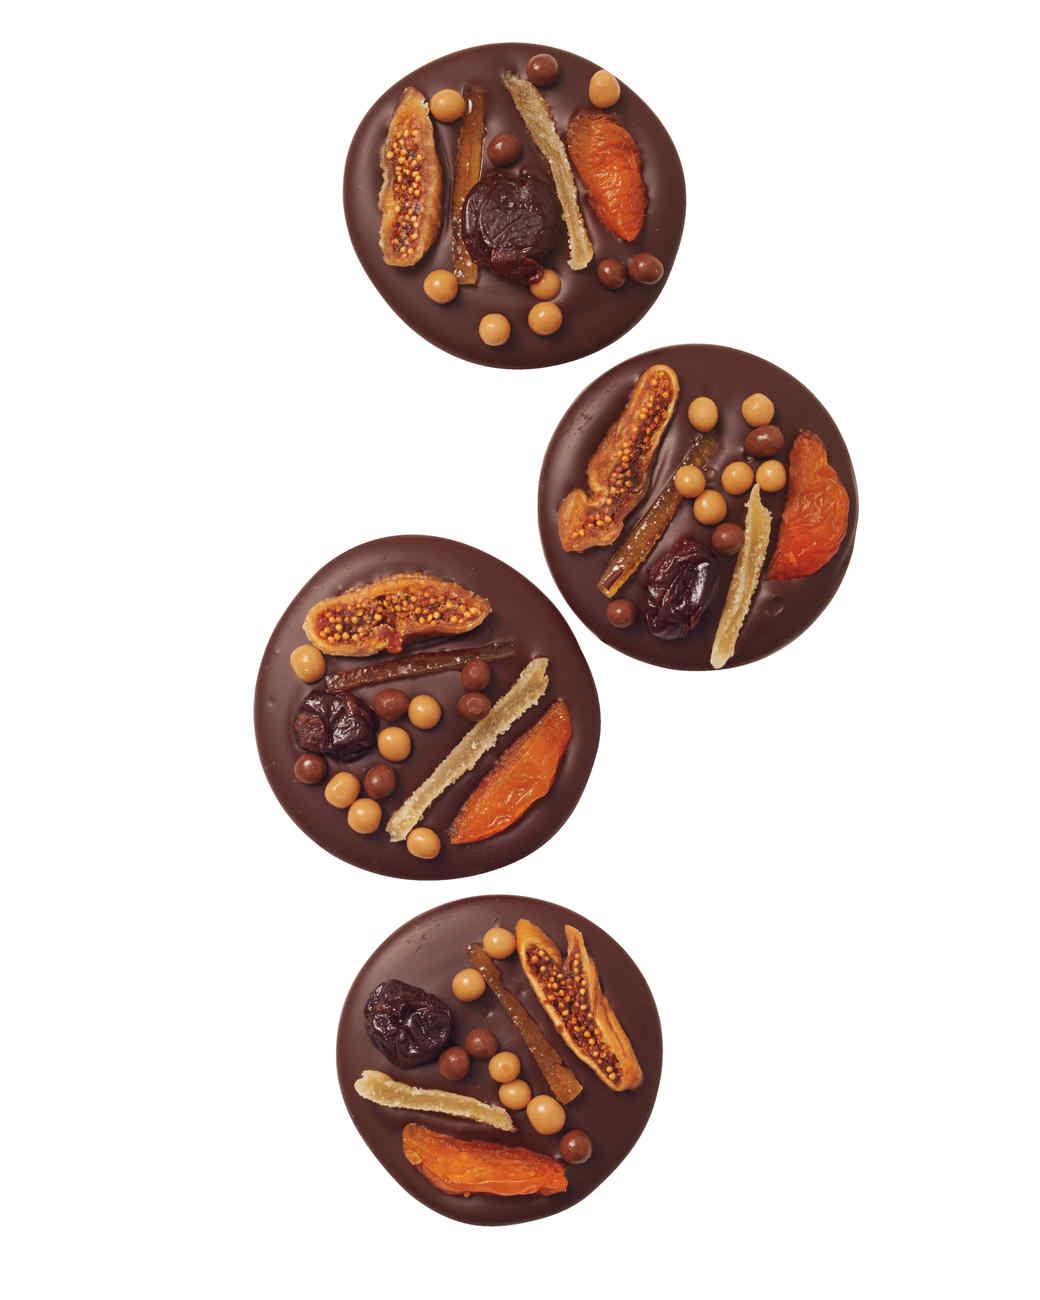 fruit-chocolates-108-d112519.jpg